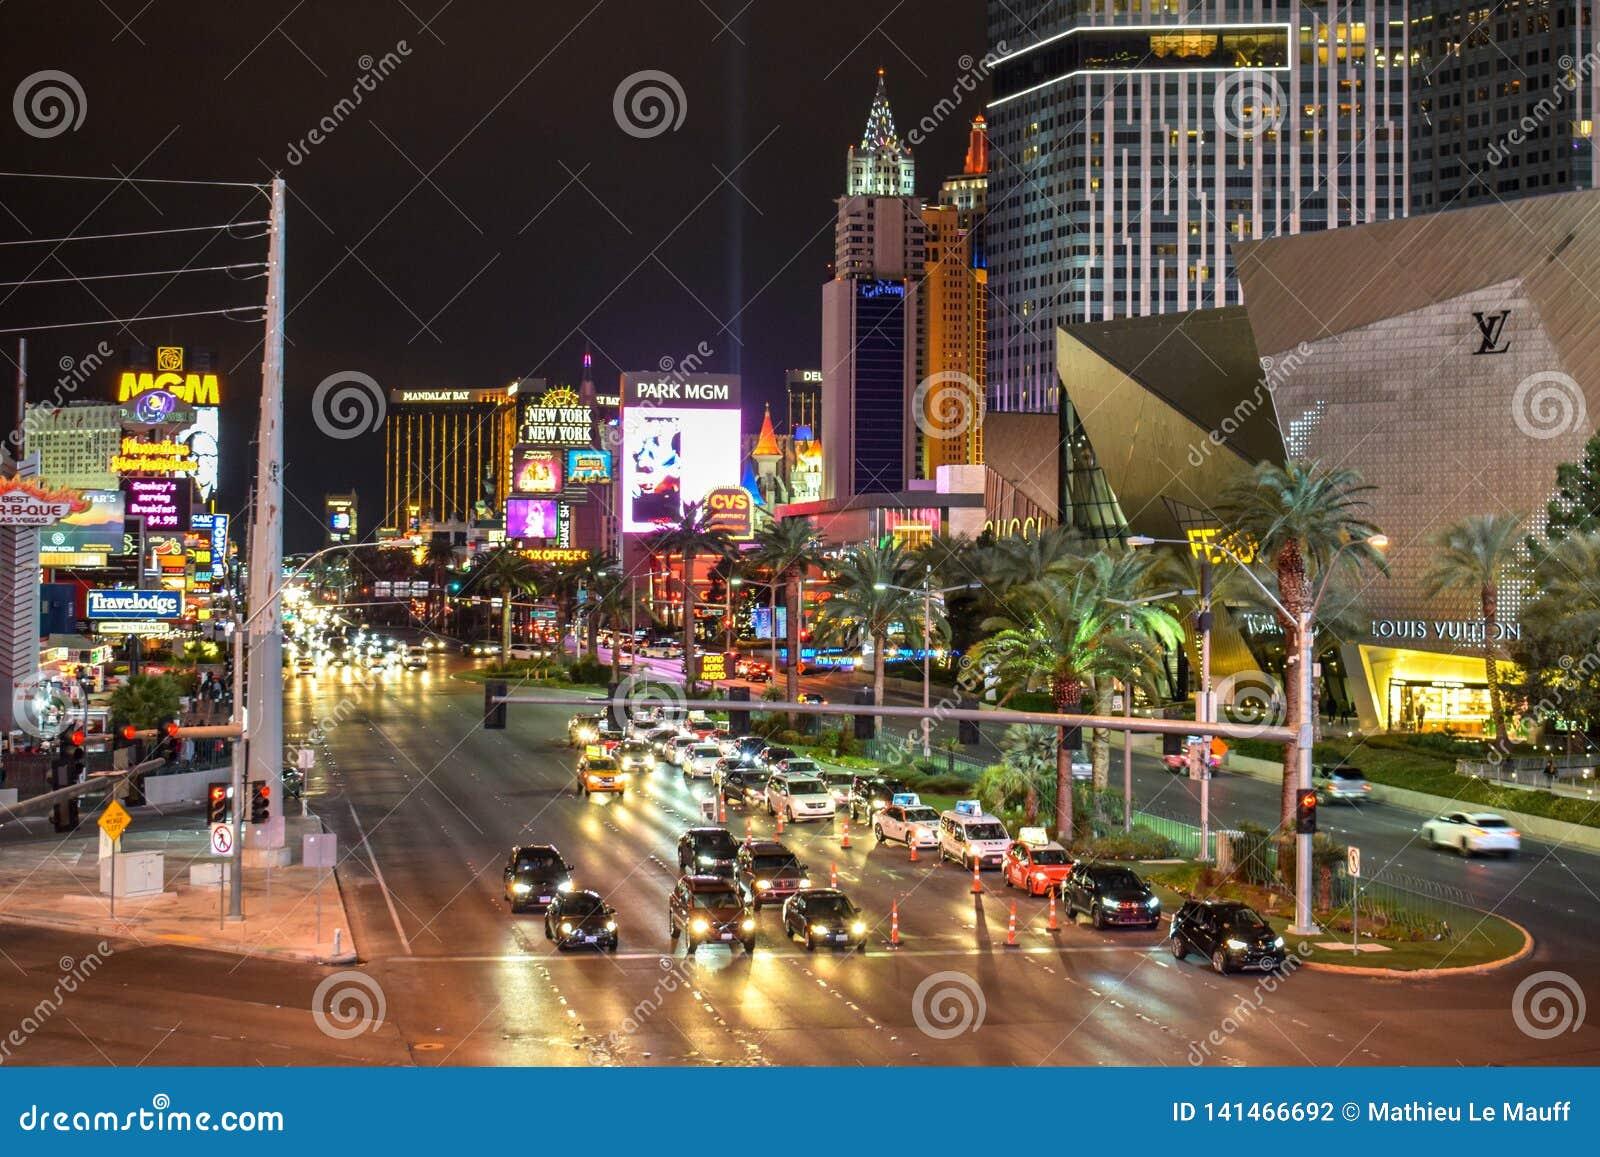 Las Vegas Strip Traffic by Night